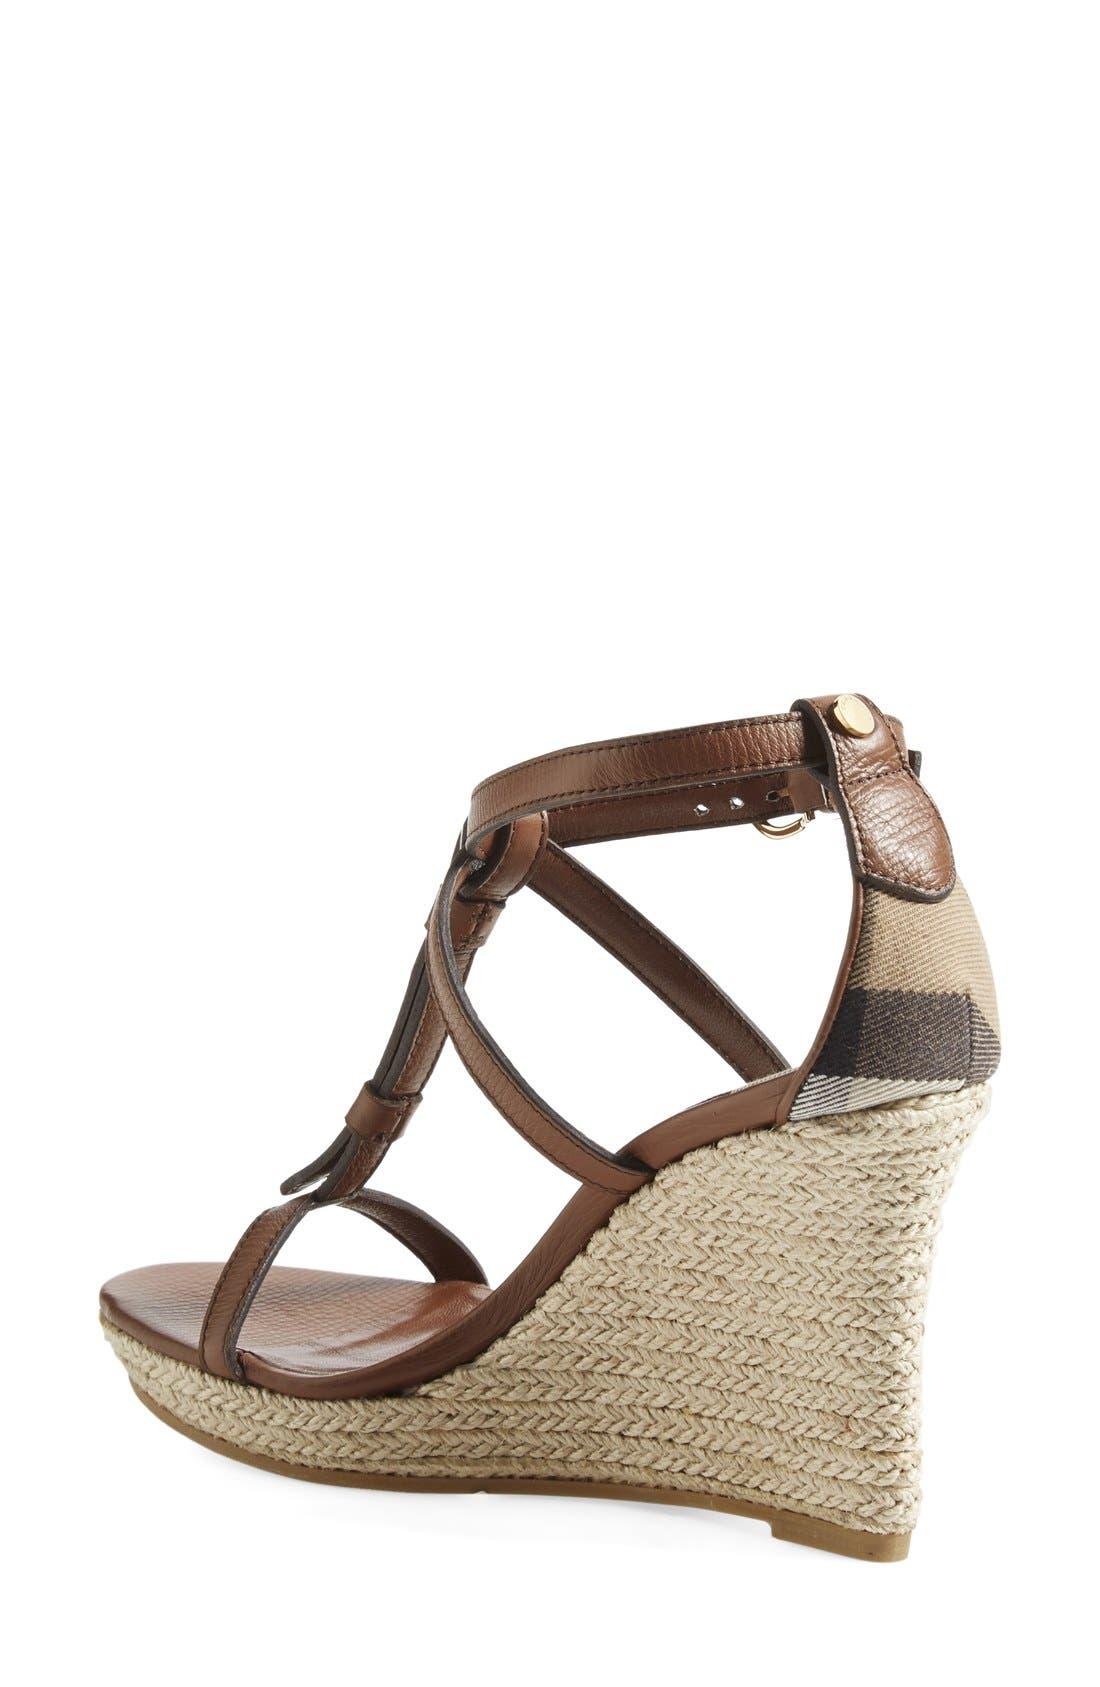 Alternate Image 2  - Burberry 'Wedland' Espadrille Wedge Sandal (Women)